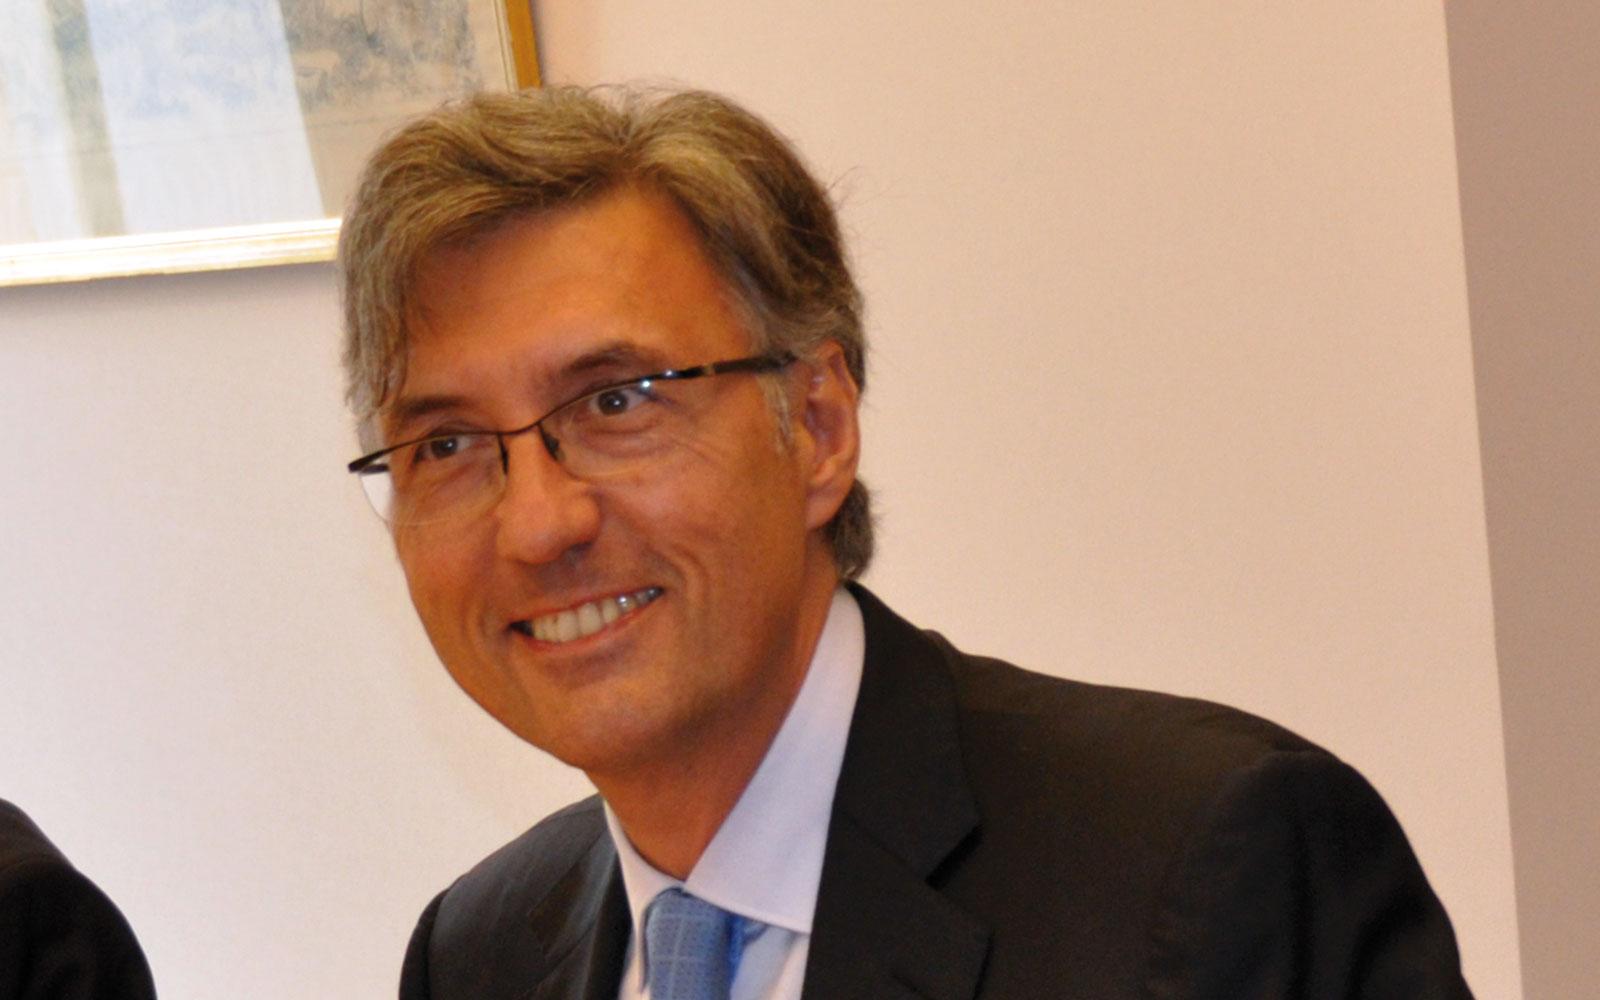 Jean-Louis-Grinda